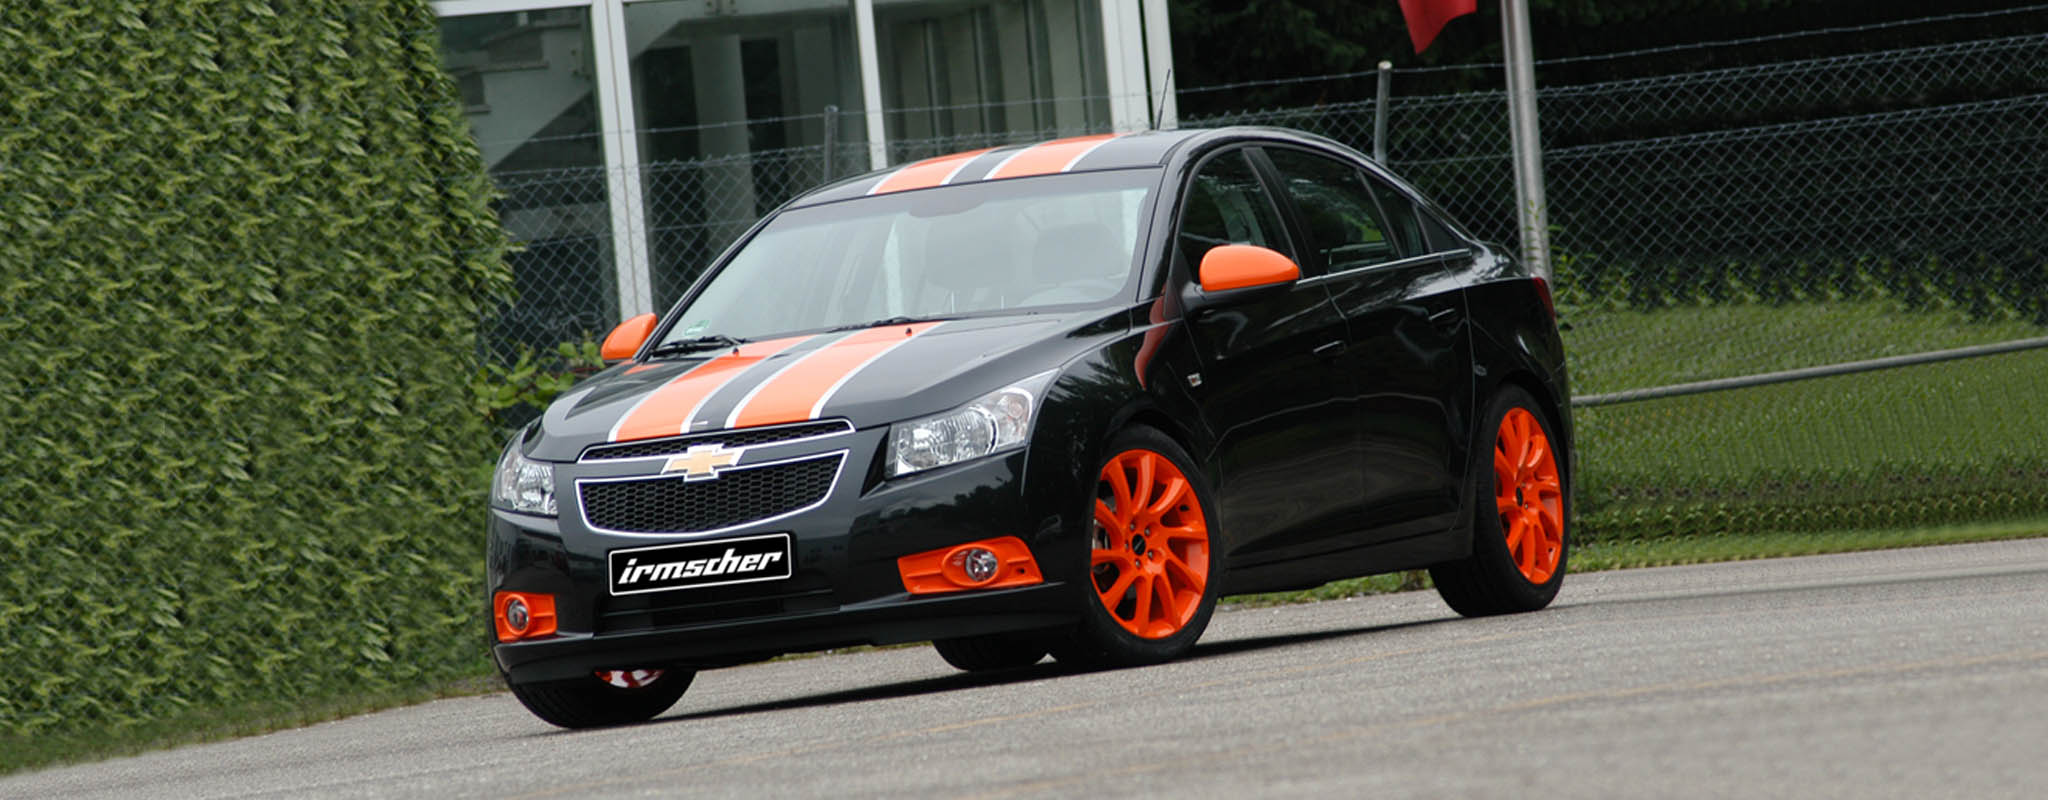 Chevrolet Cruze NB